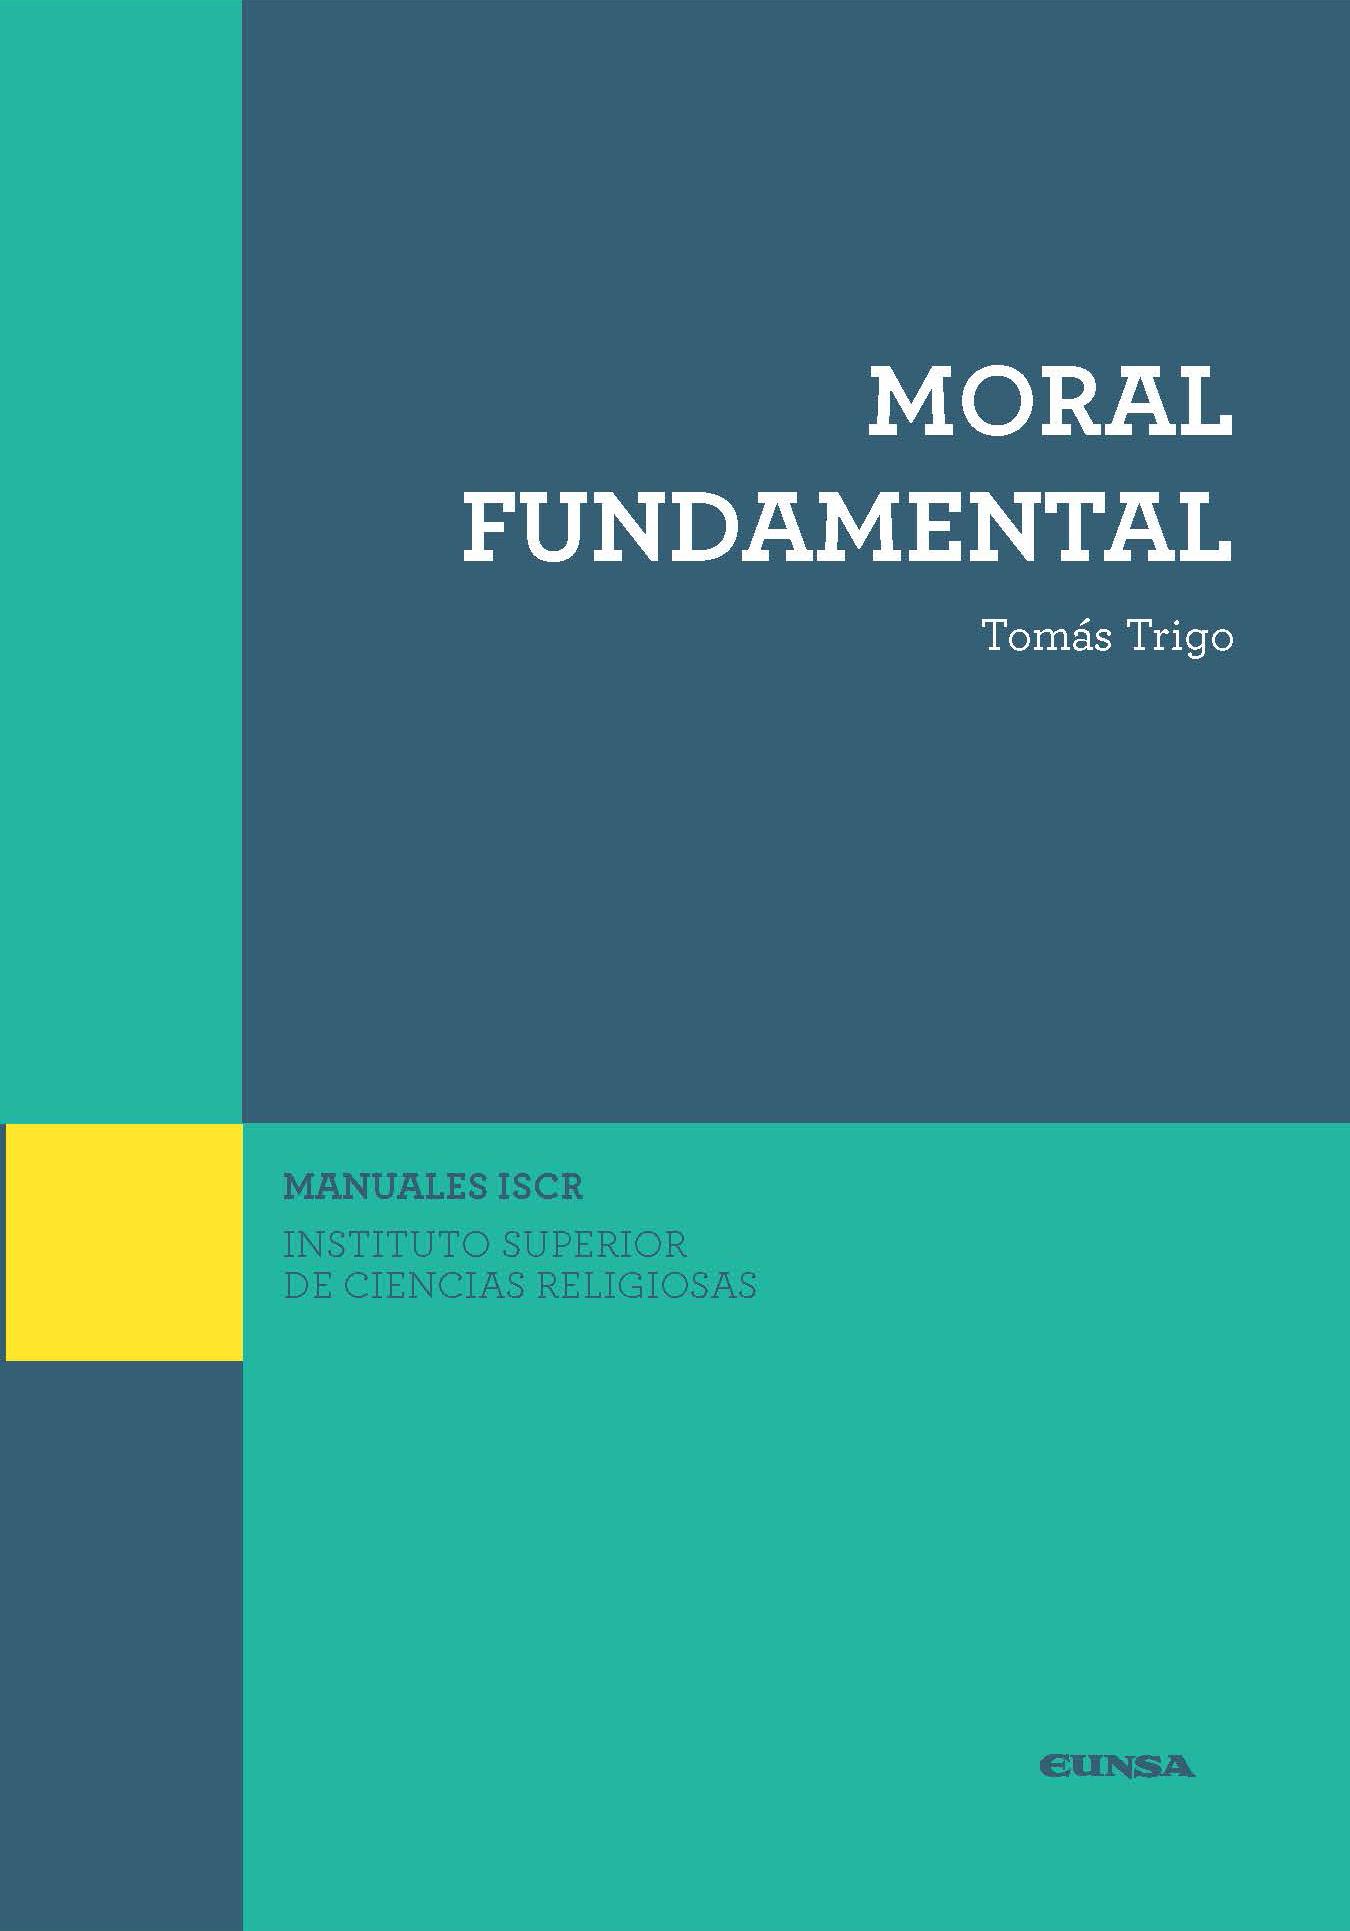 (ISCR) MORAL FUNDAMENTAL